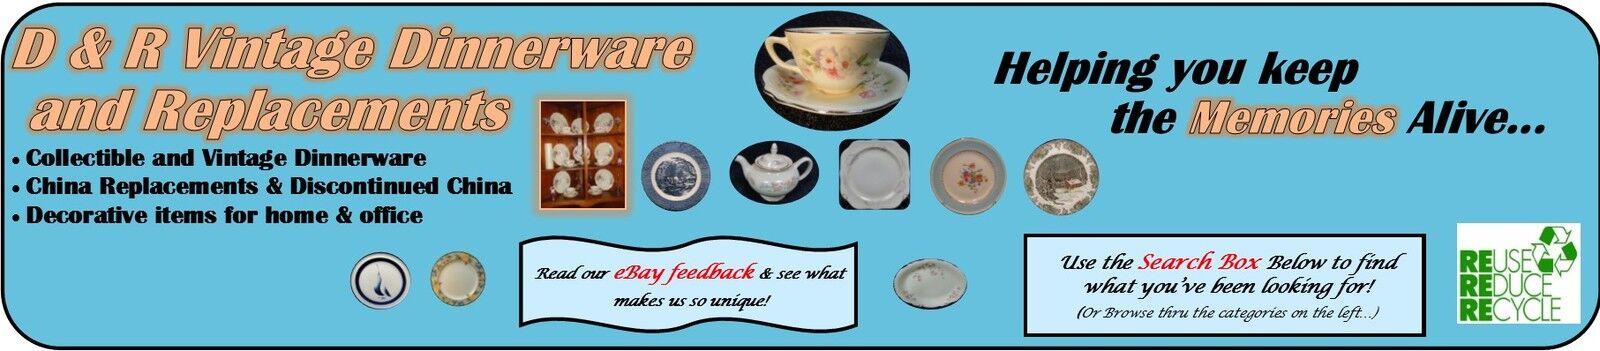 D&R Vintage Dinnerware Replacements